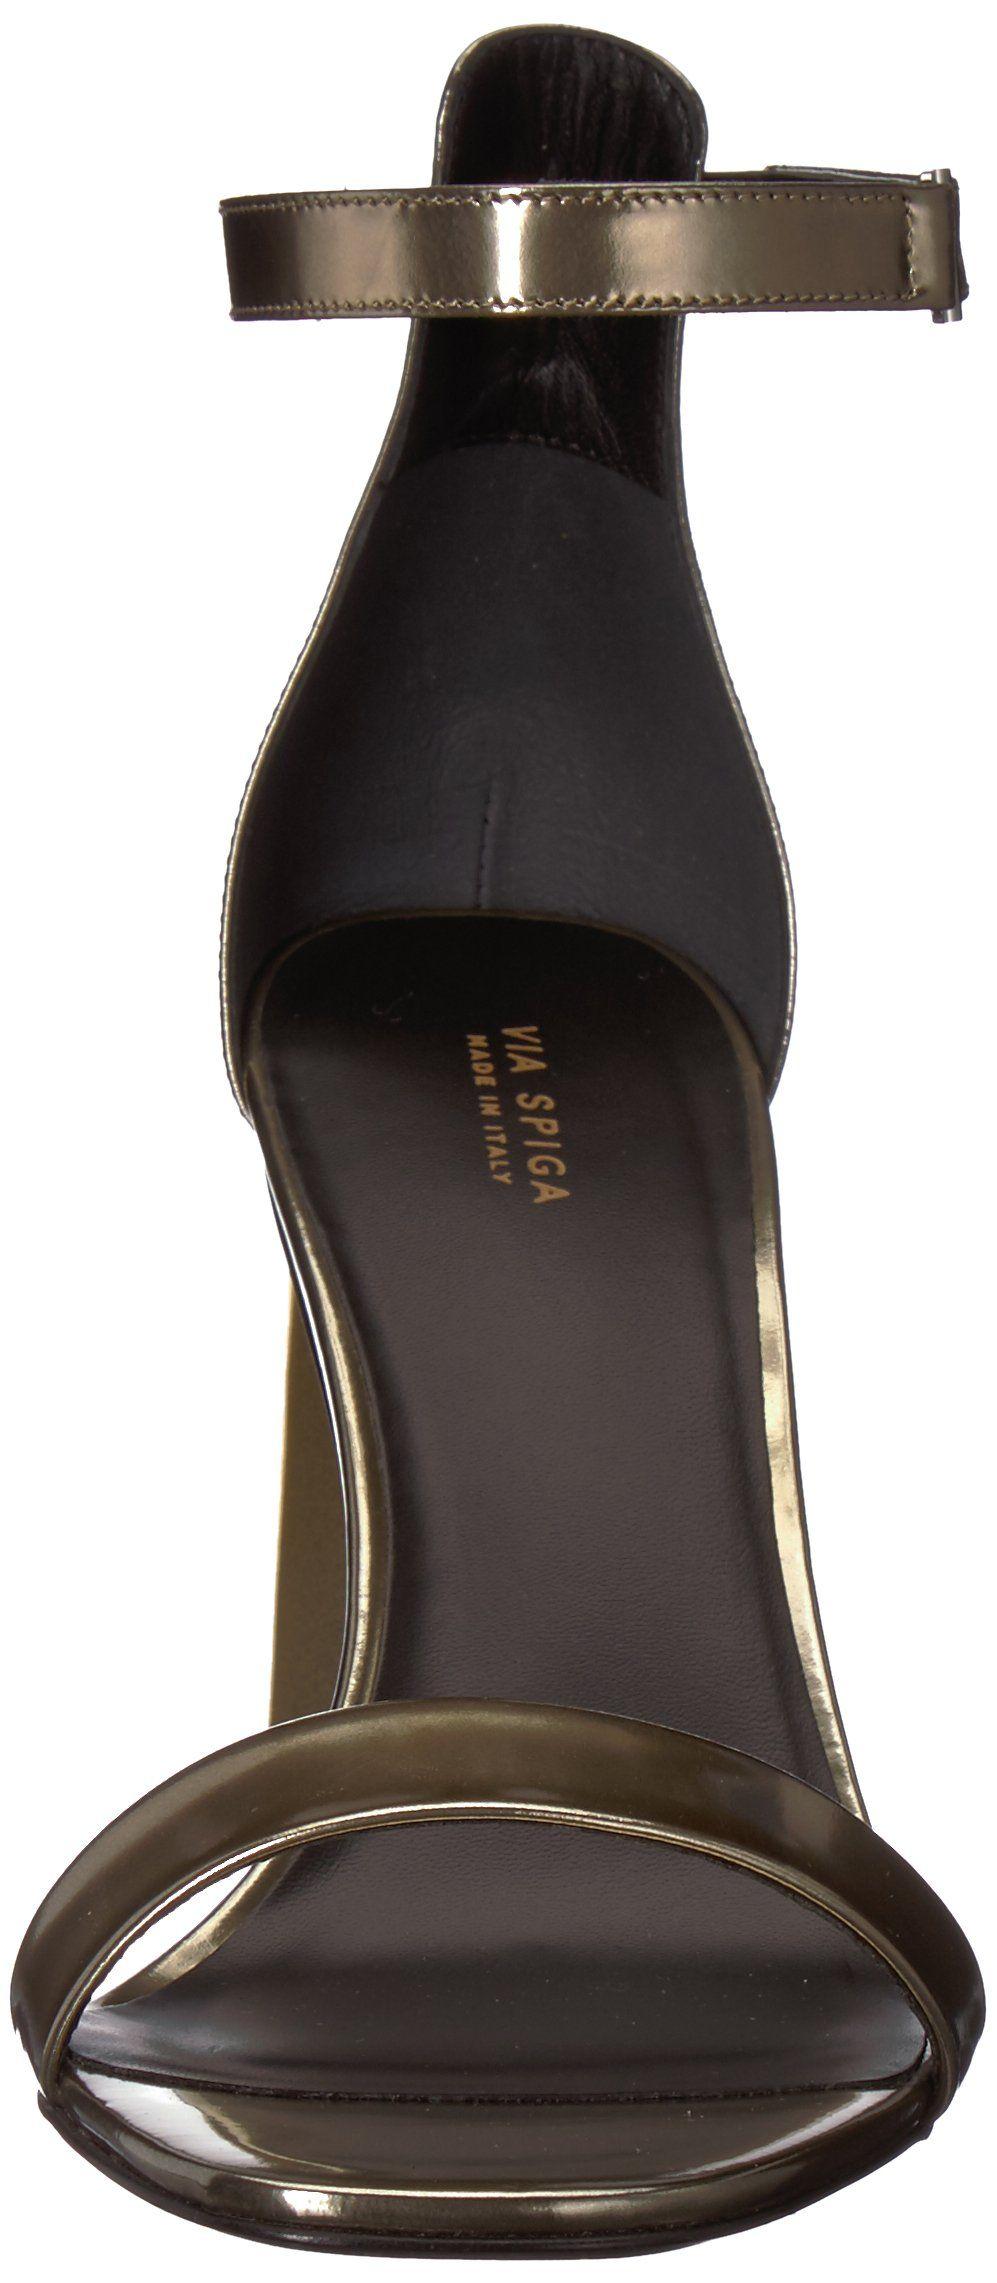 c4c1b3a5a4d Via Spiga Womens Faxon Angular Heeled Sandal Copper Leather 6.5 ...